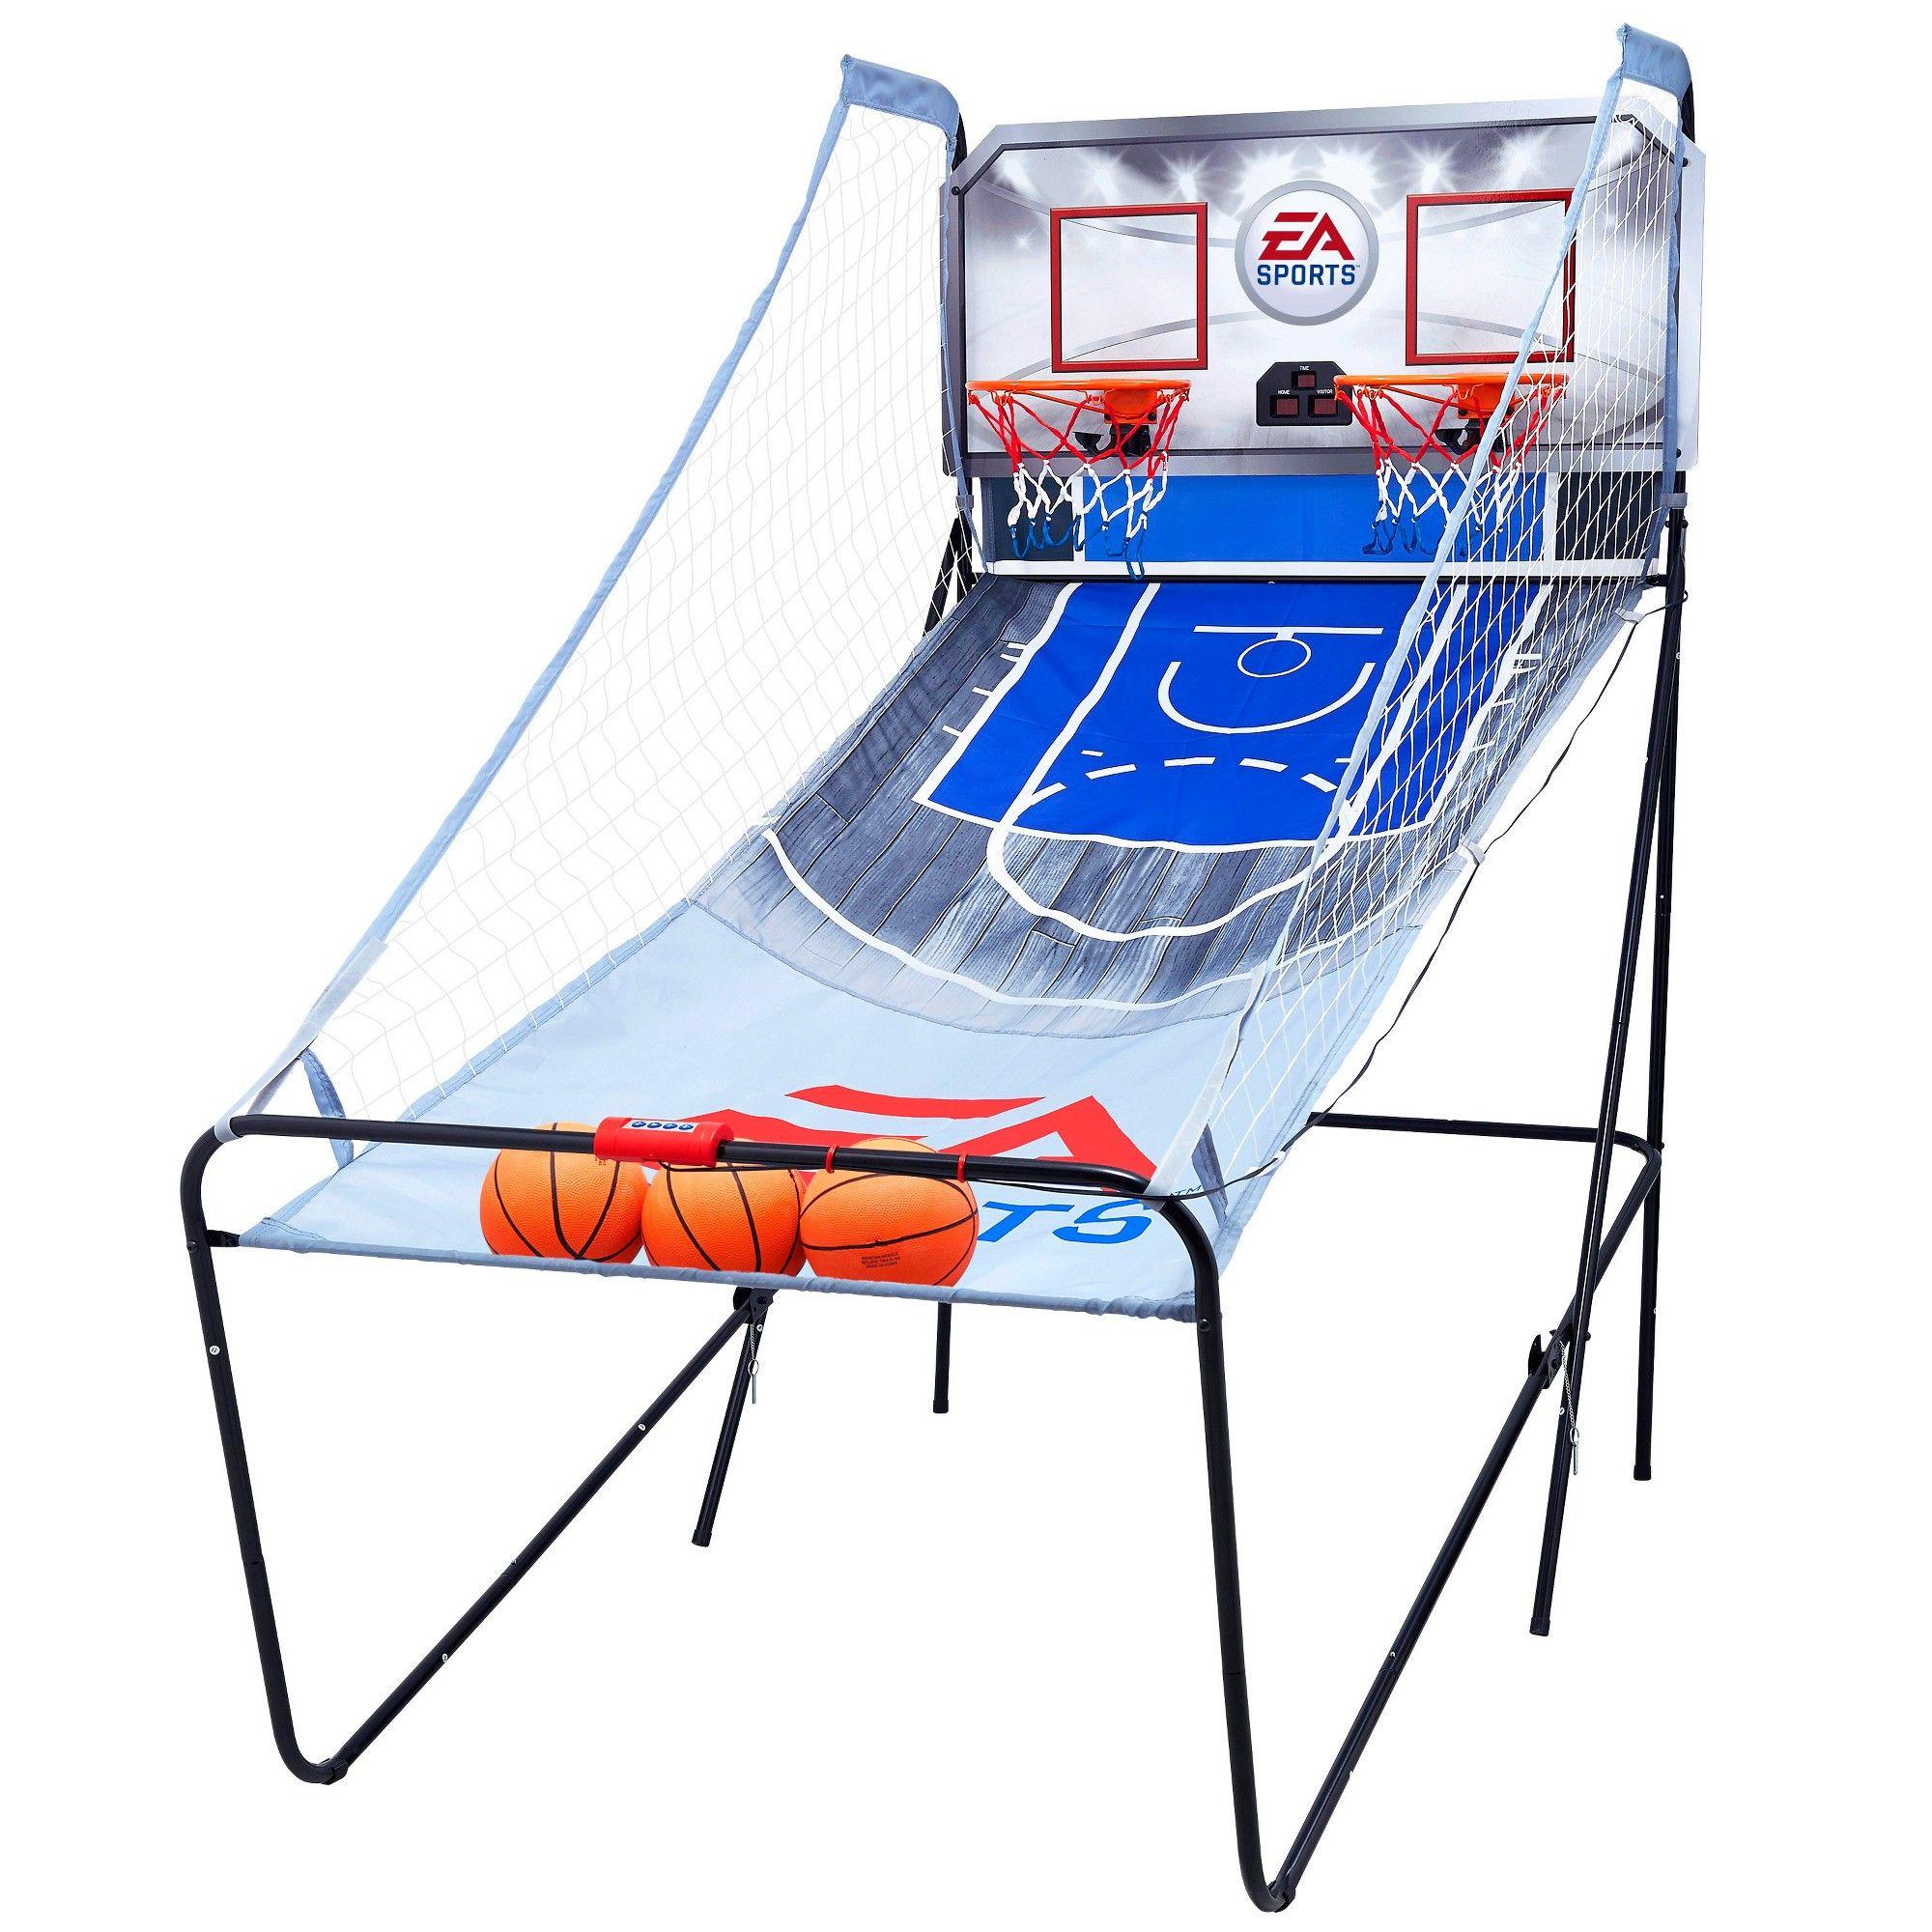 Basketball Arcade Game Indoor ESPN 2 Players Kids Hoop Electronic Sport Foldable